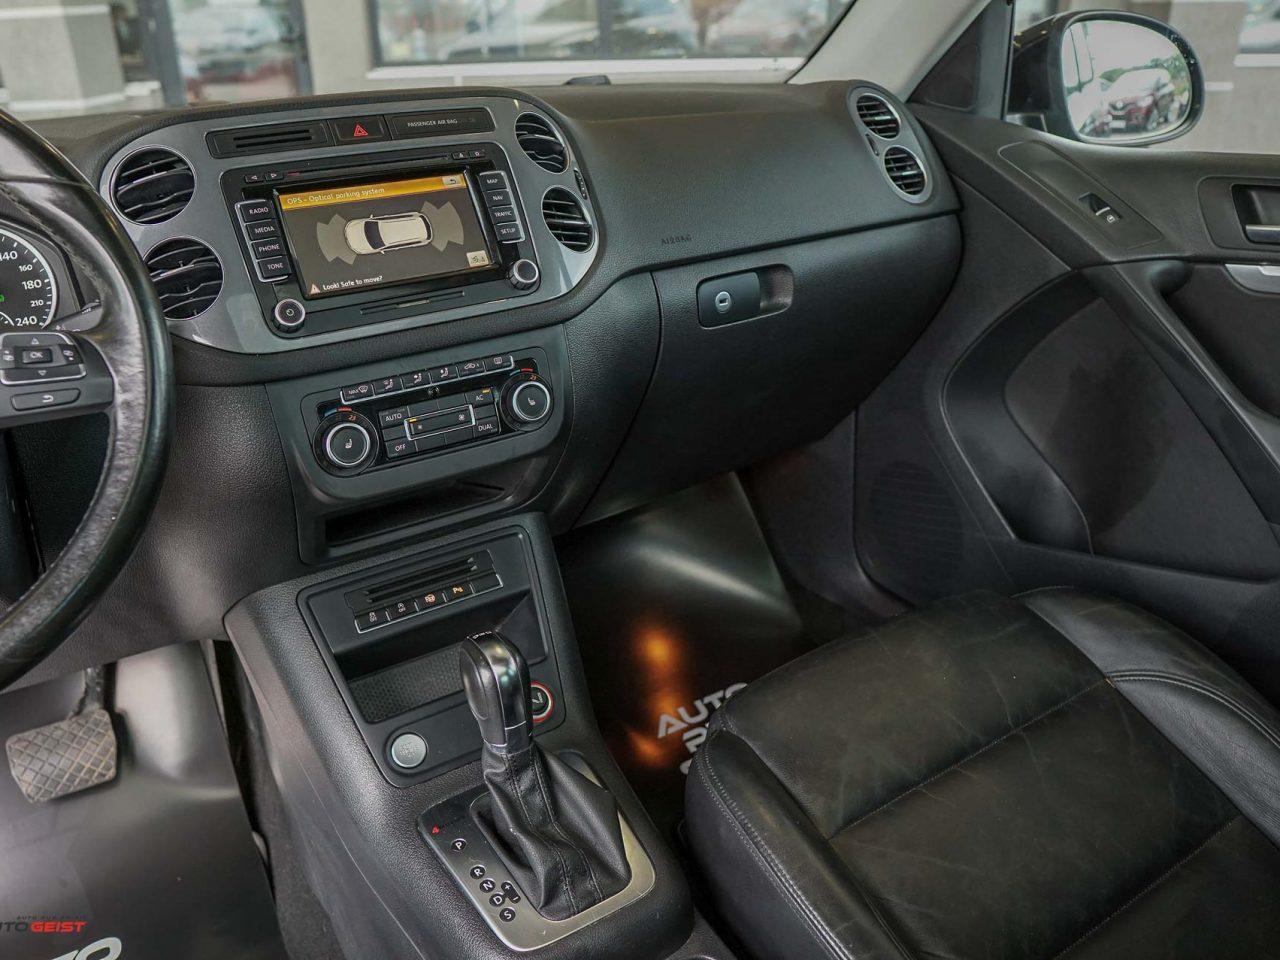 volkswagen-tiguan-4motion-dsg-panoramic-01223